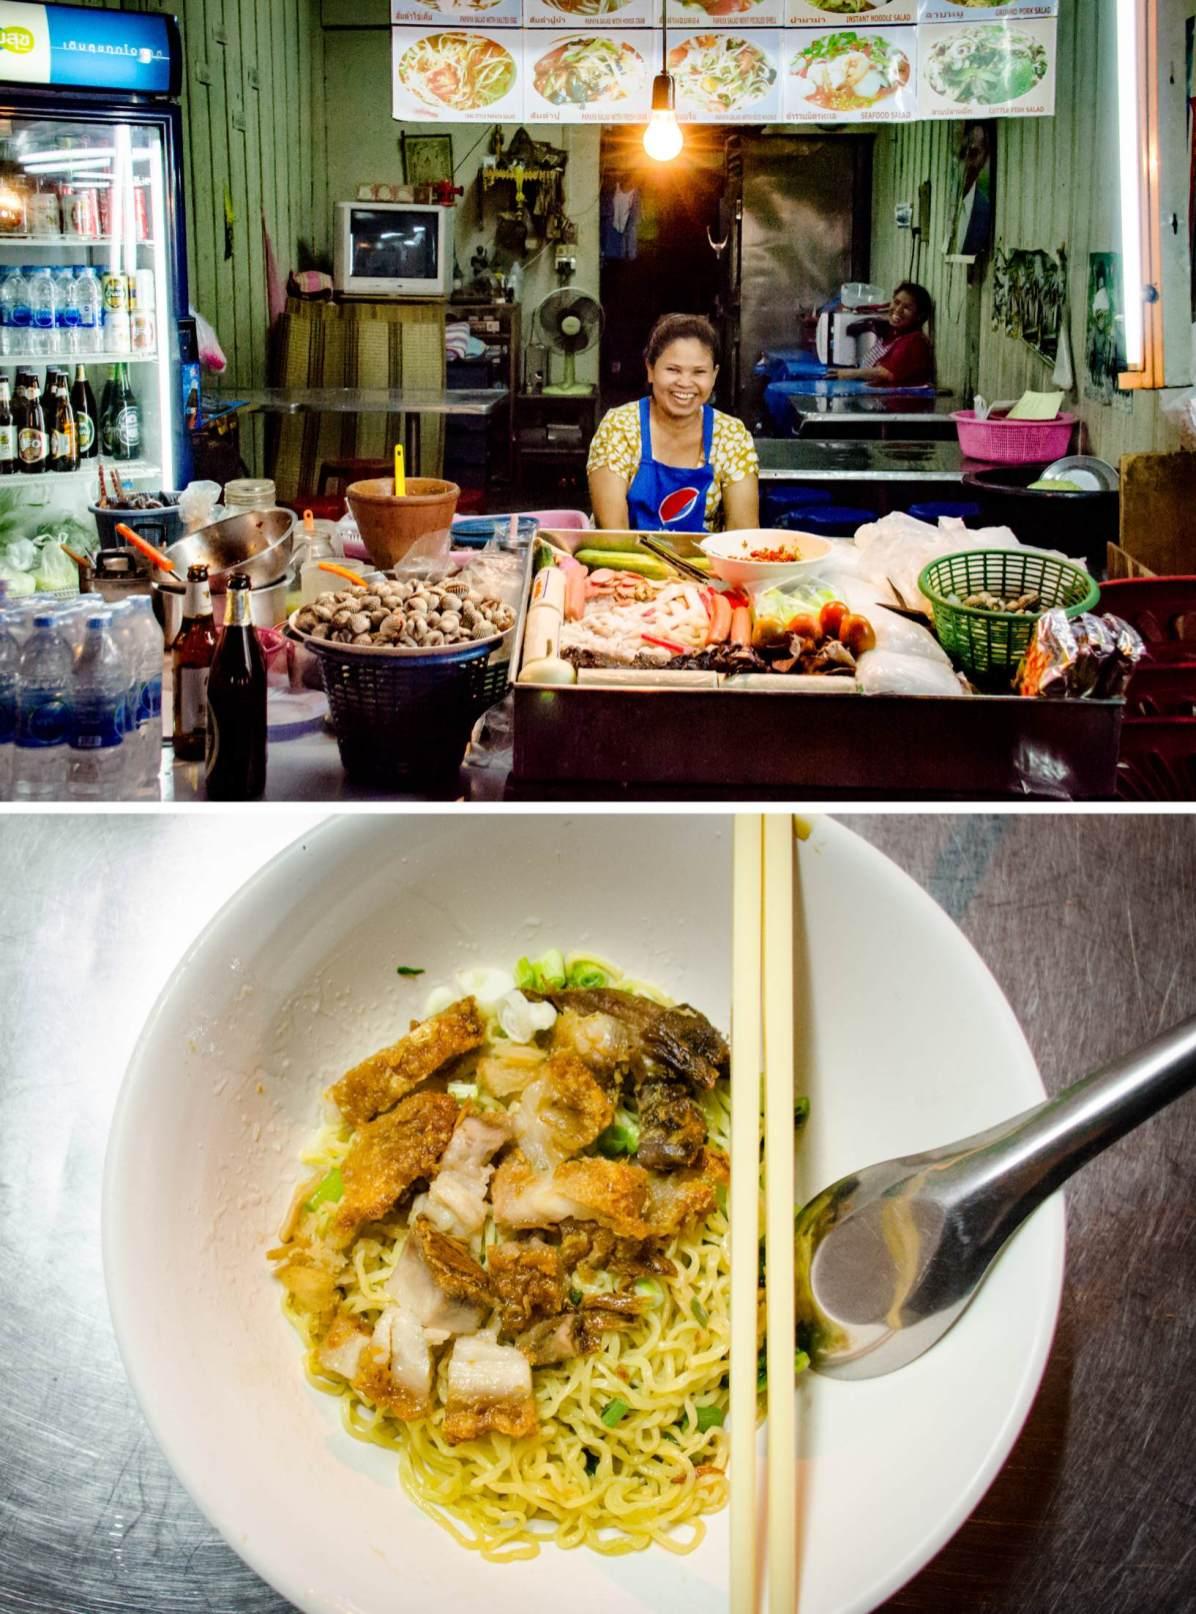 Bangkok Travel Blog, Thailand: For me, Bangkok is food. | Thaïlande: Pour moi, Bangkok, c'est la bouffe. Where to stay in Bangkok